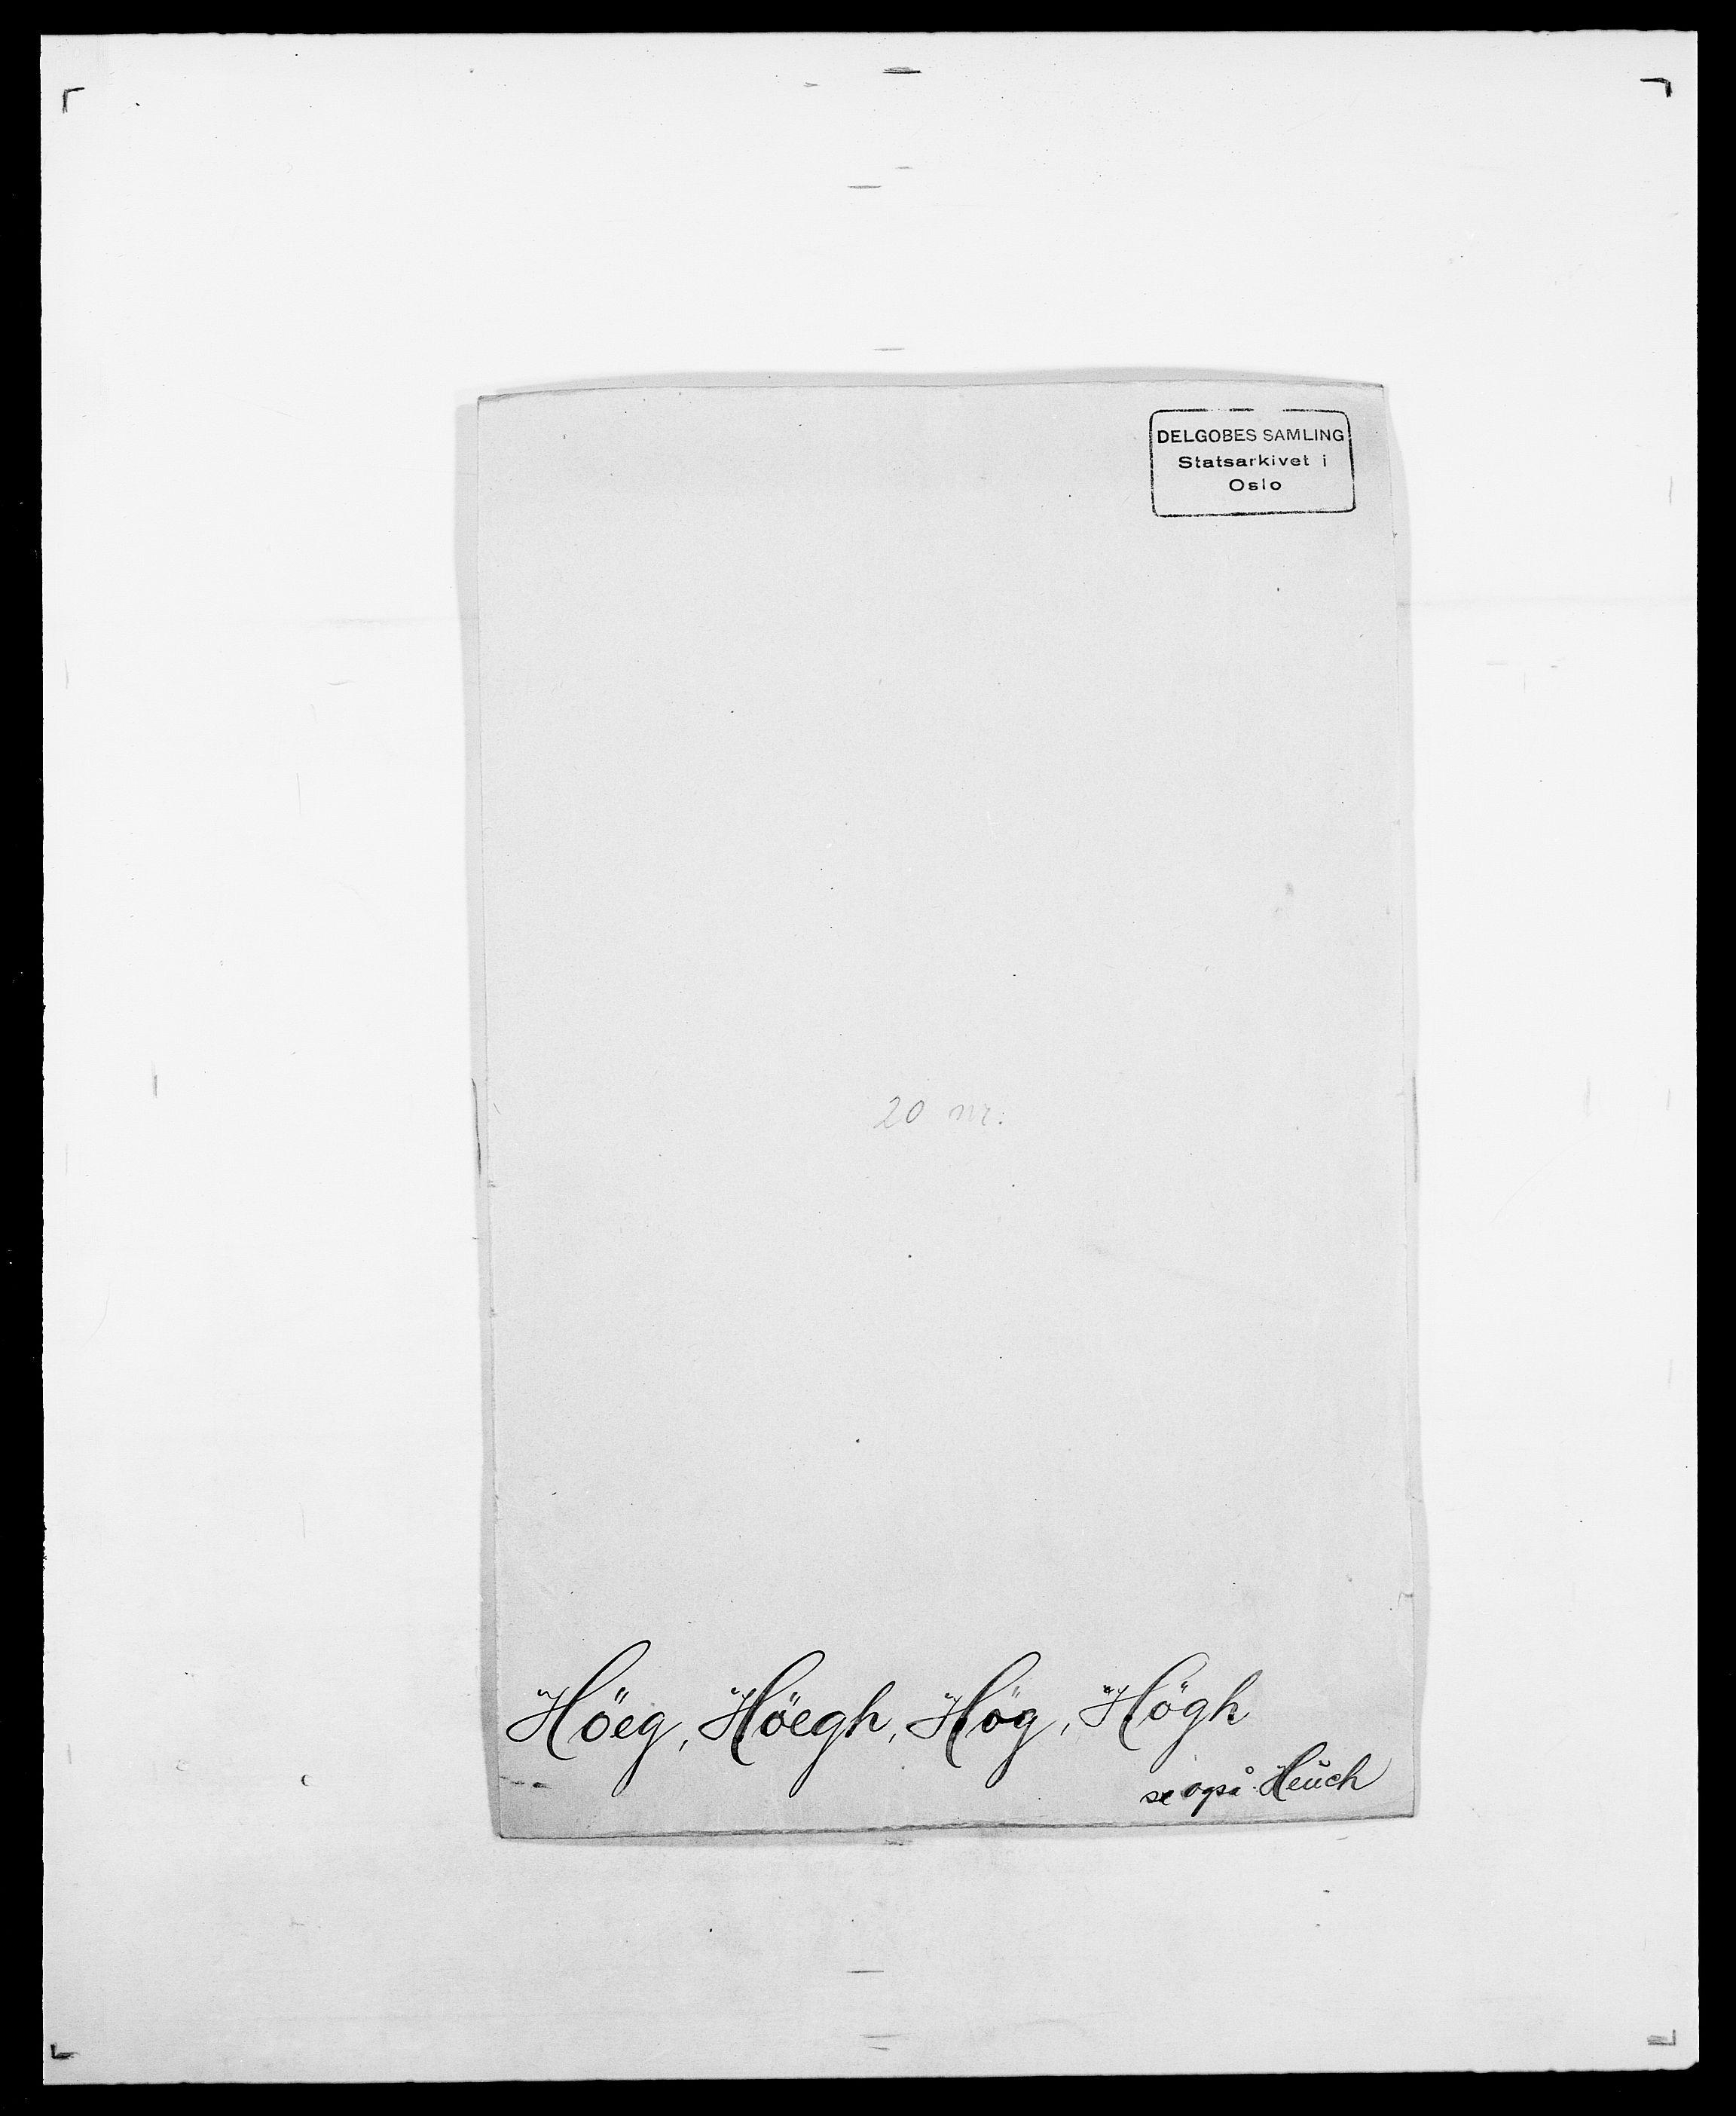 SAO, Delgobe, Charles Antoine - samling, D/Da/L0019: van der Hude - Joys, s. 313